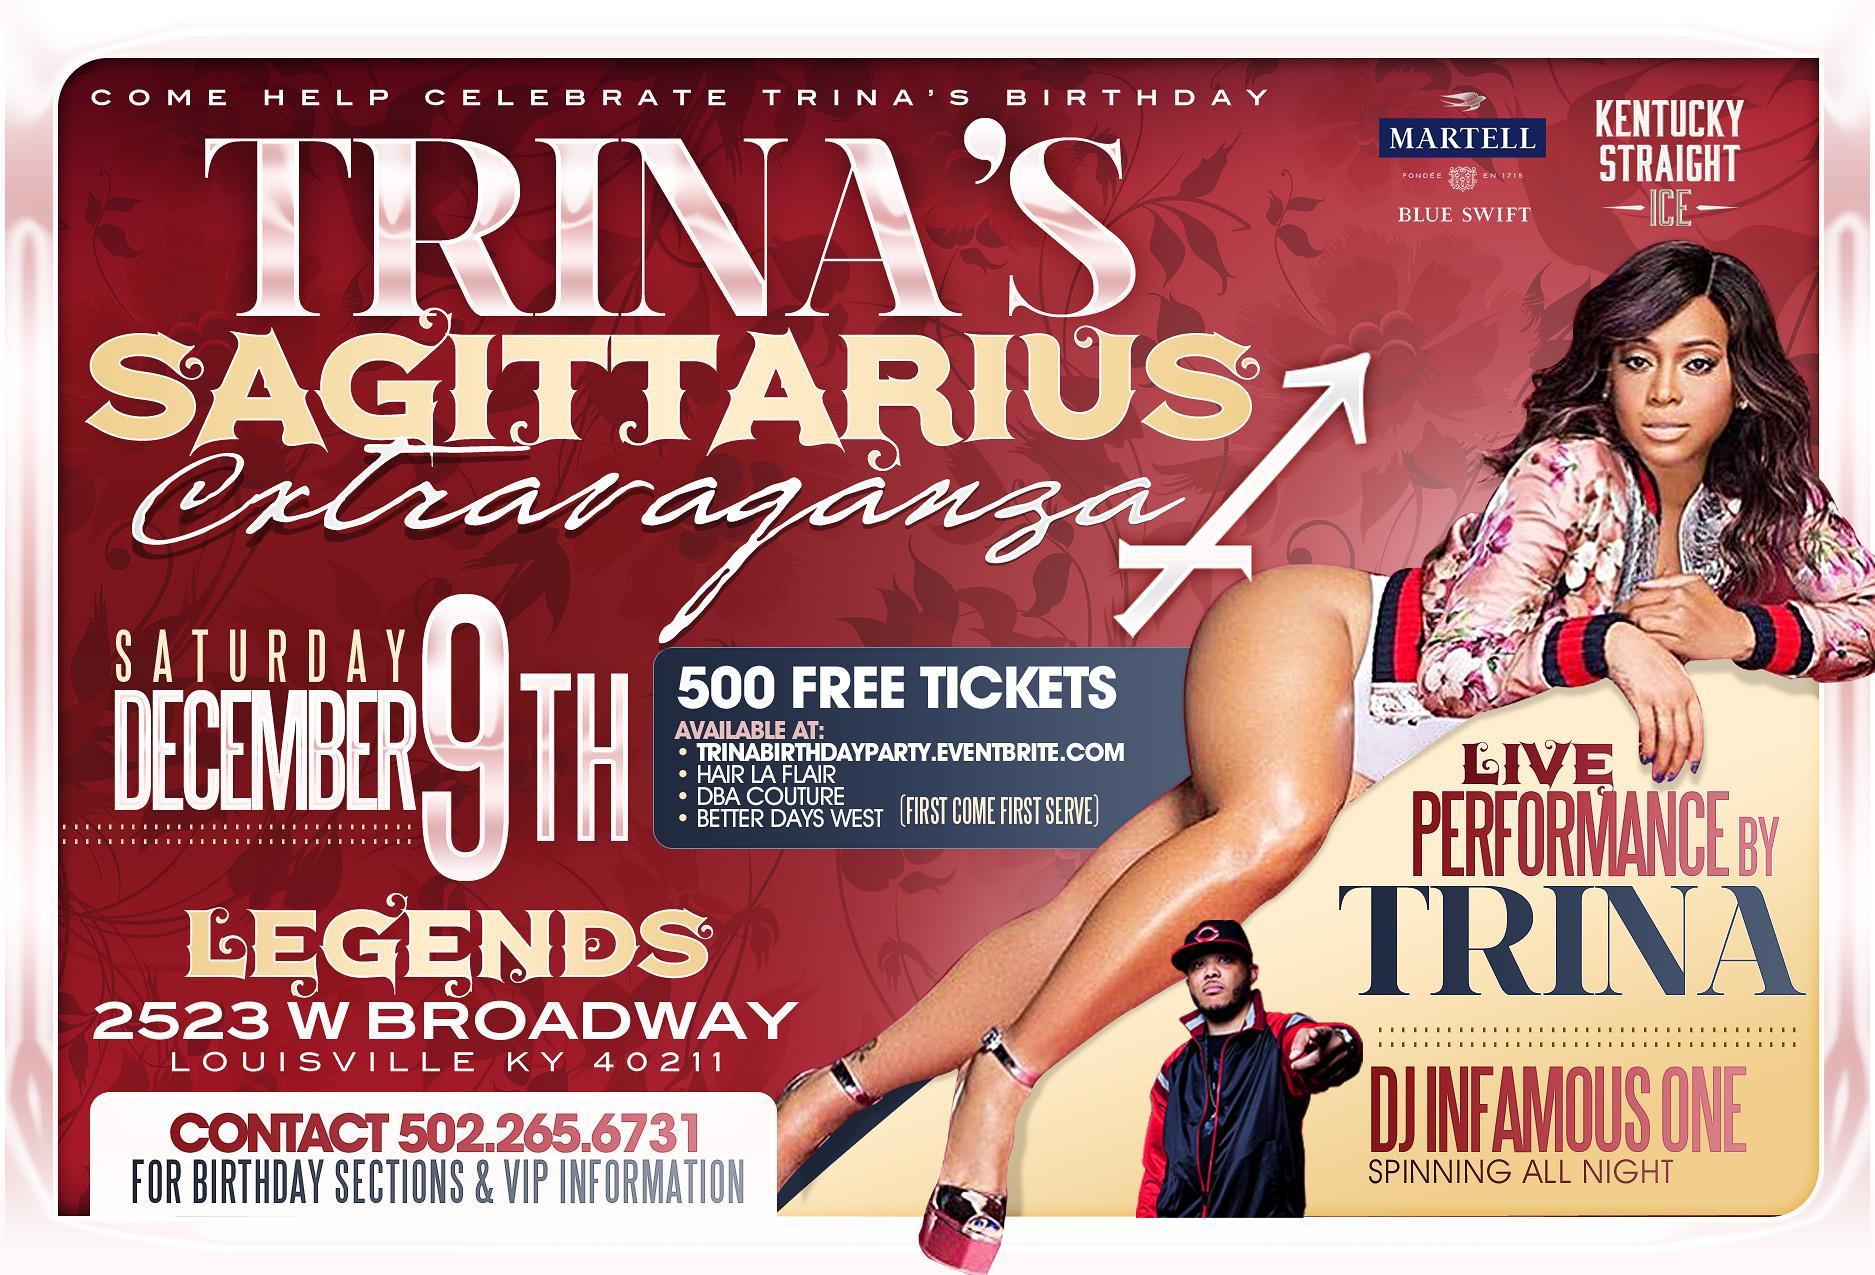 Trina's Sagittarius Extravaganza  | Louisville, KY | Legends Bar & Grill | December 9, 2017